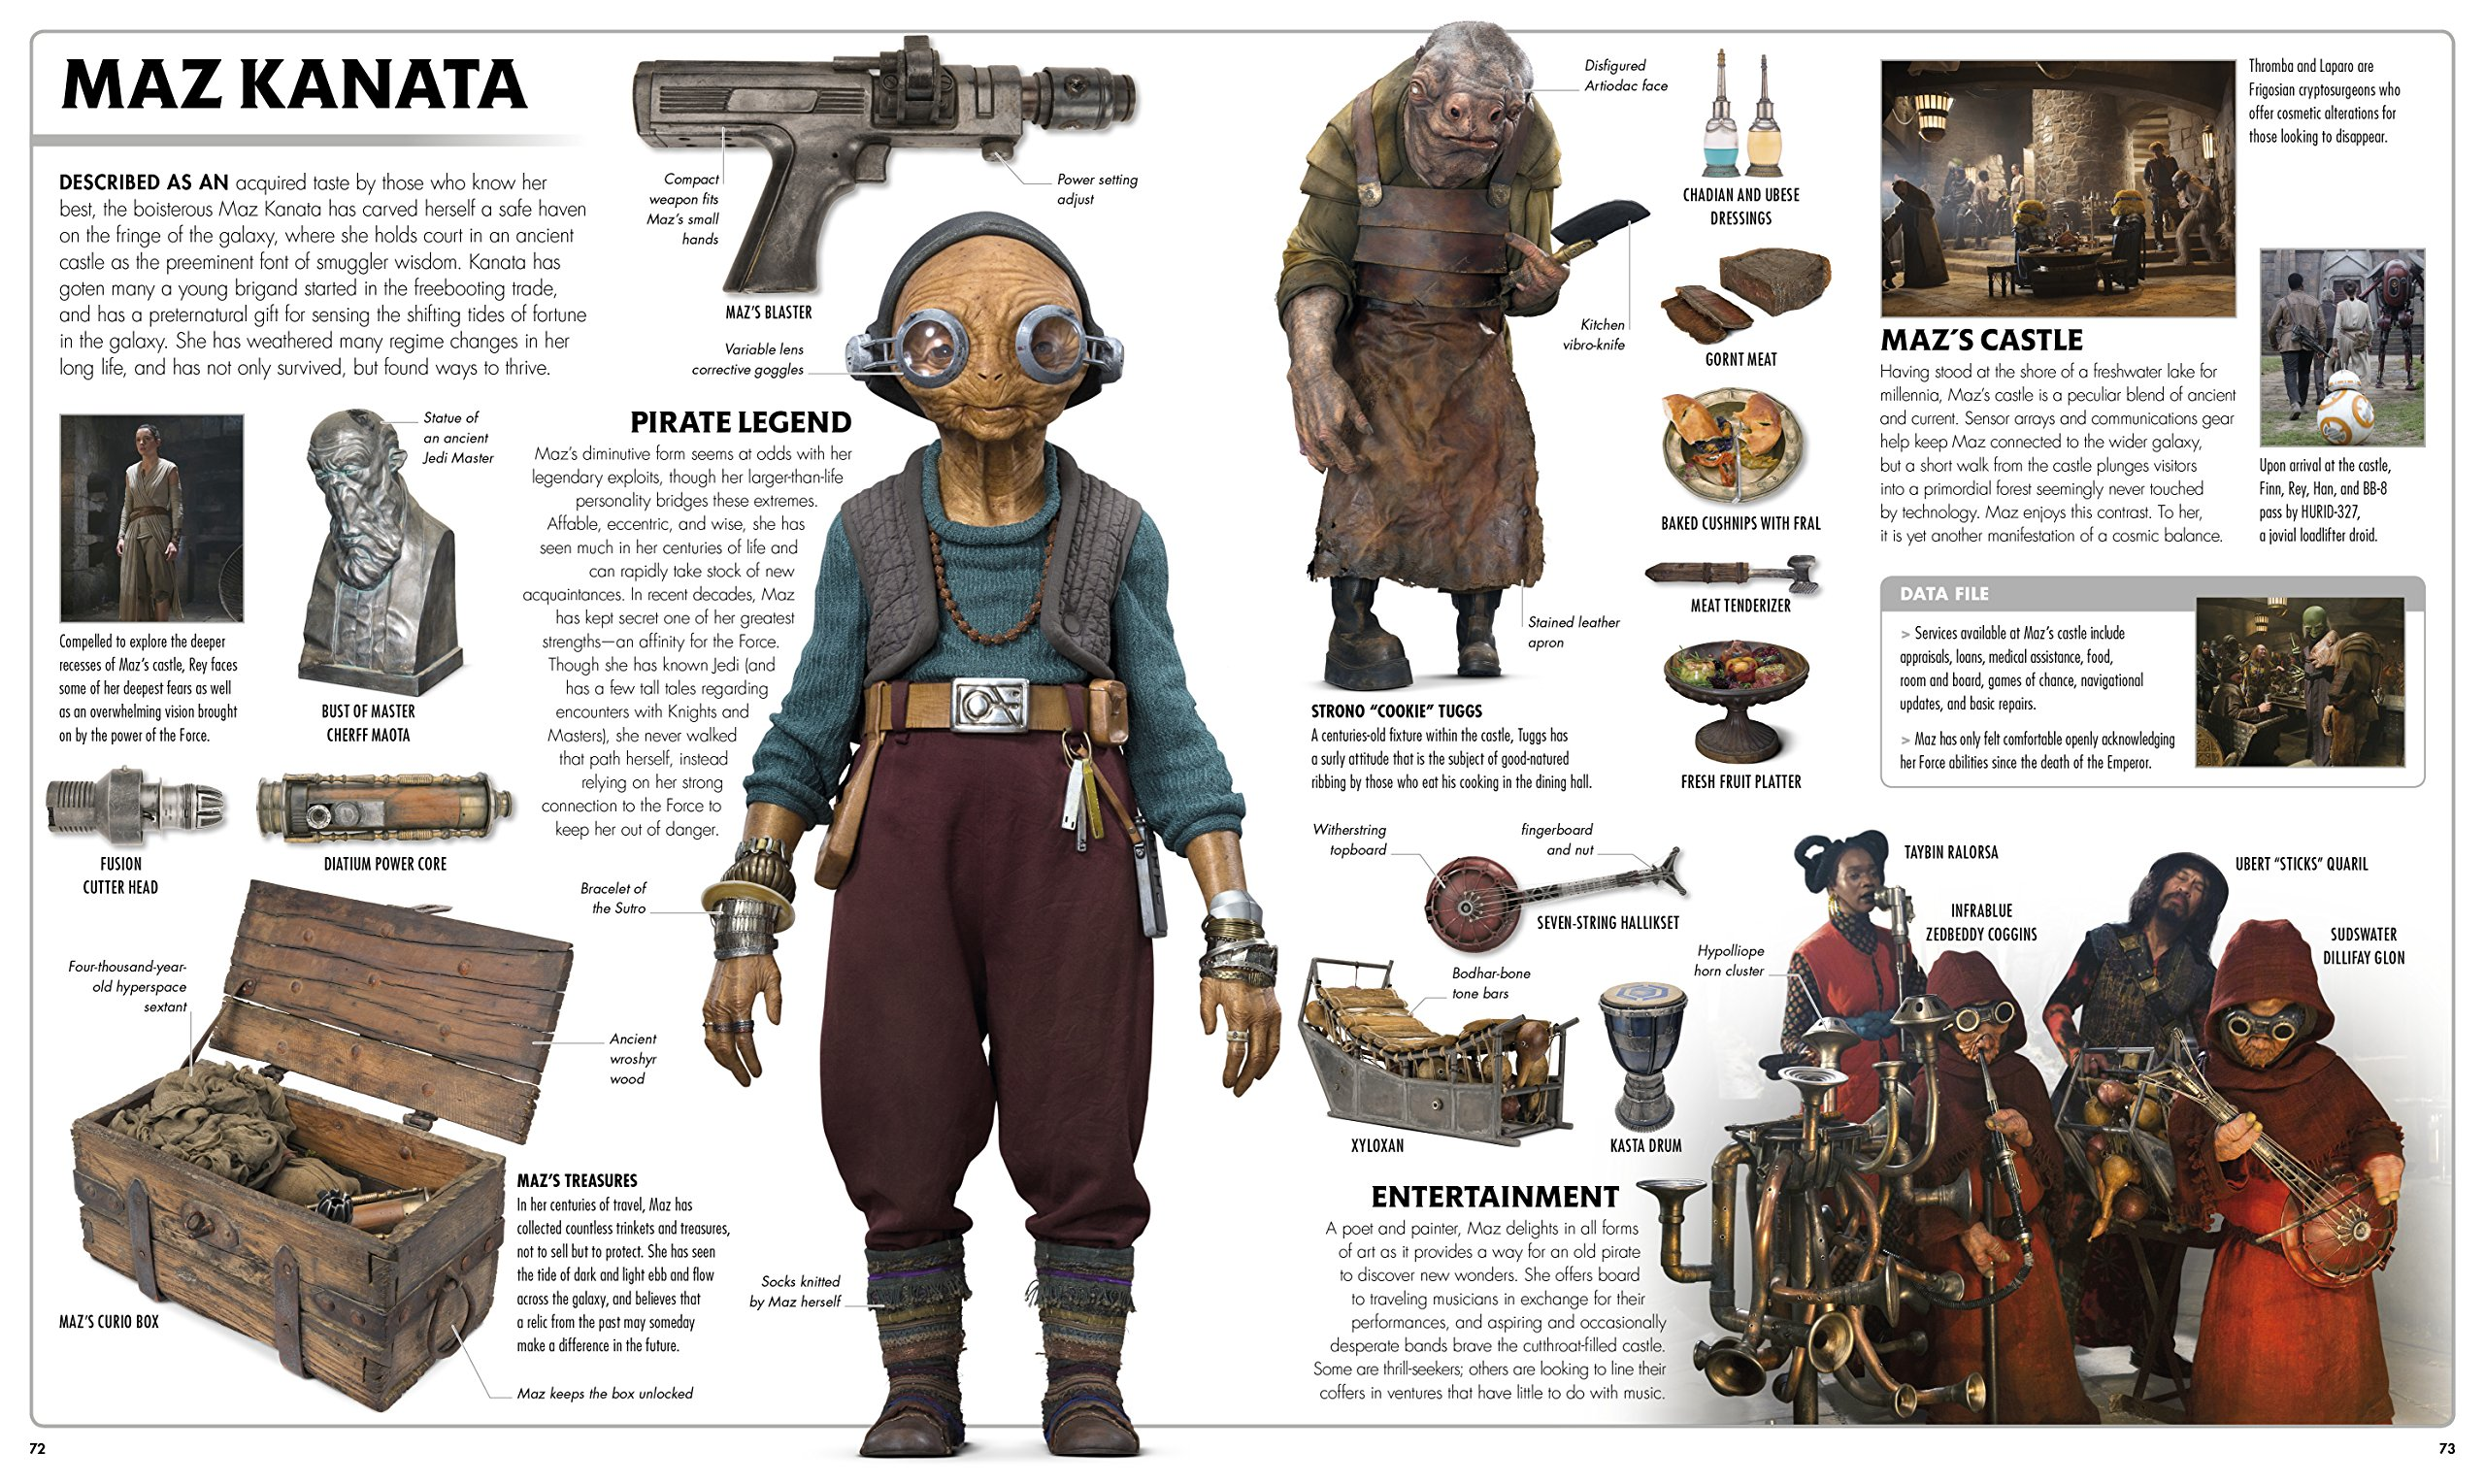 Star Wars The Force Awakens The Visual Dictionary Hidalgo Pablo 9781465438164 Amazon Com Books